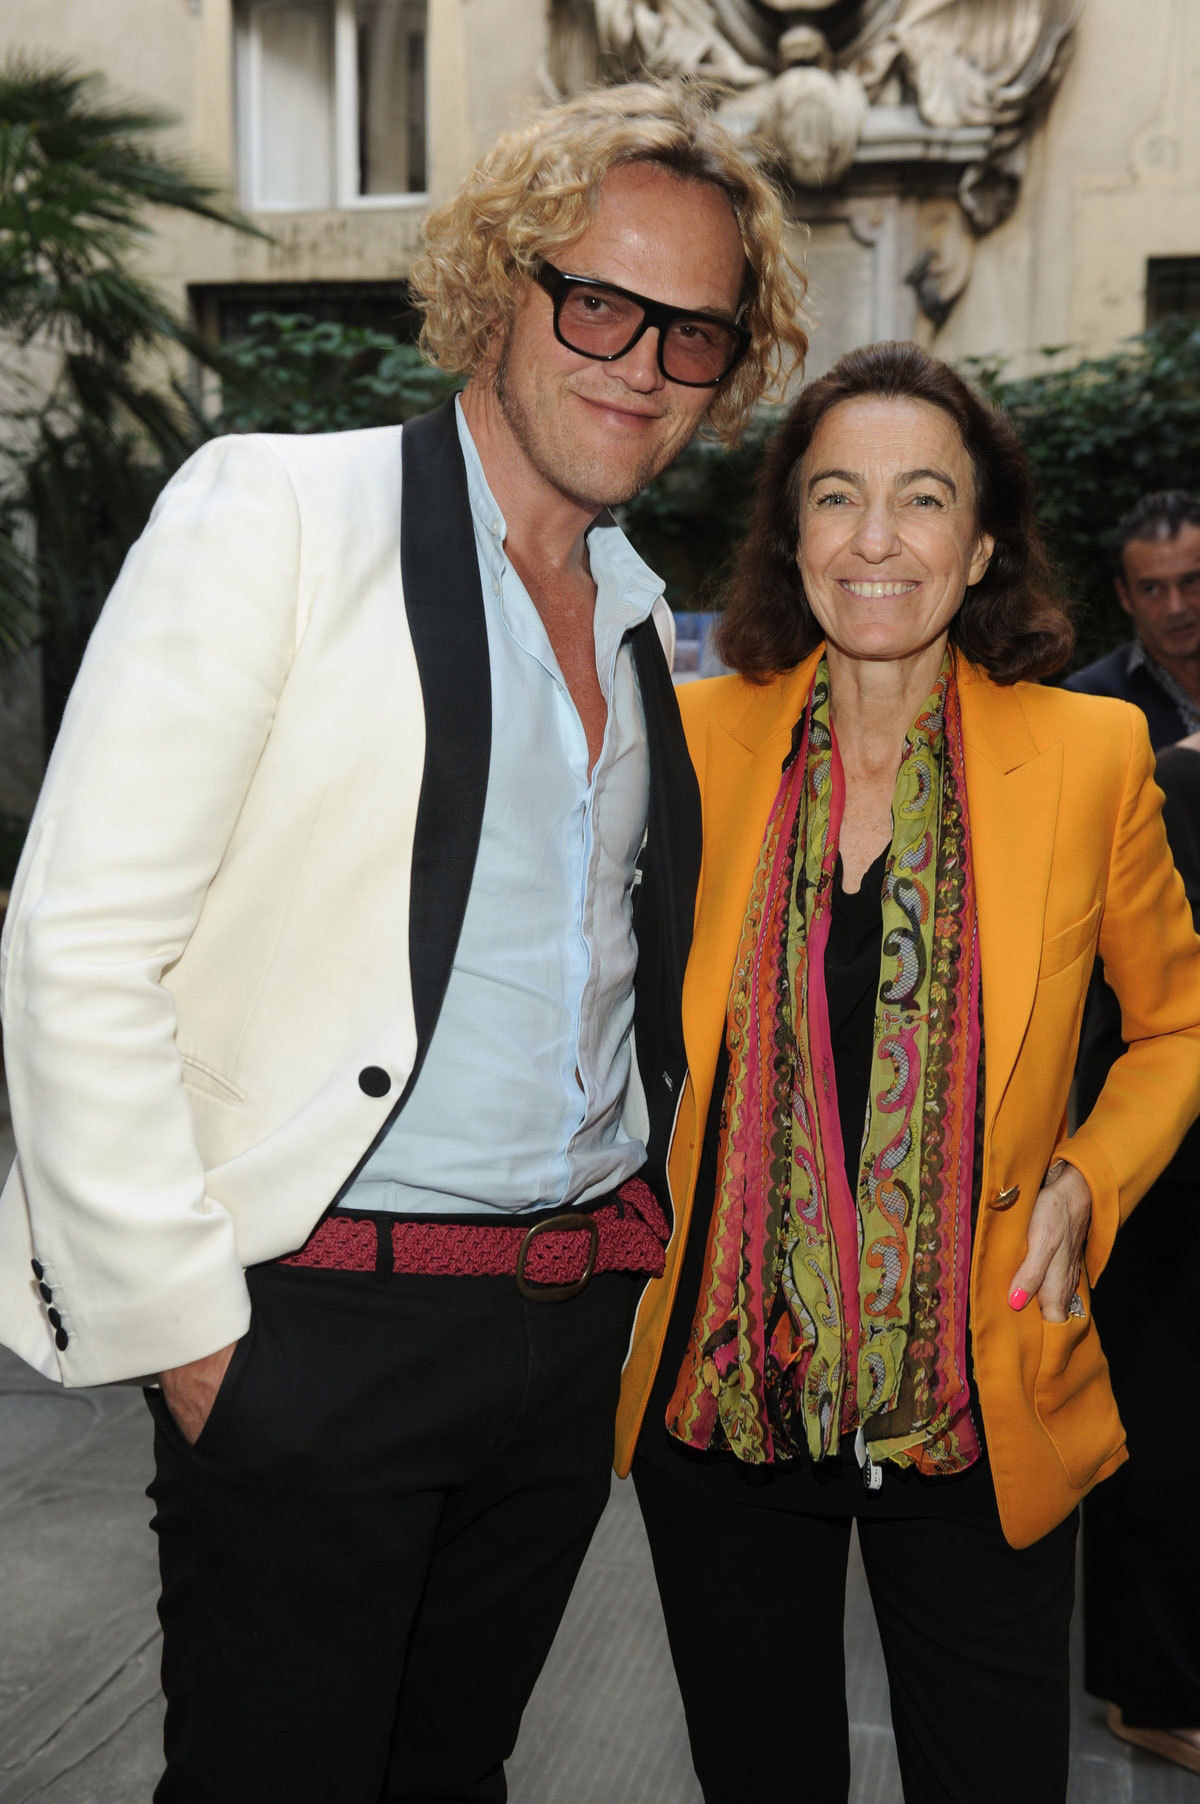 Peter dundas named the creative director of roberto cavalli